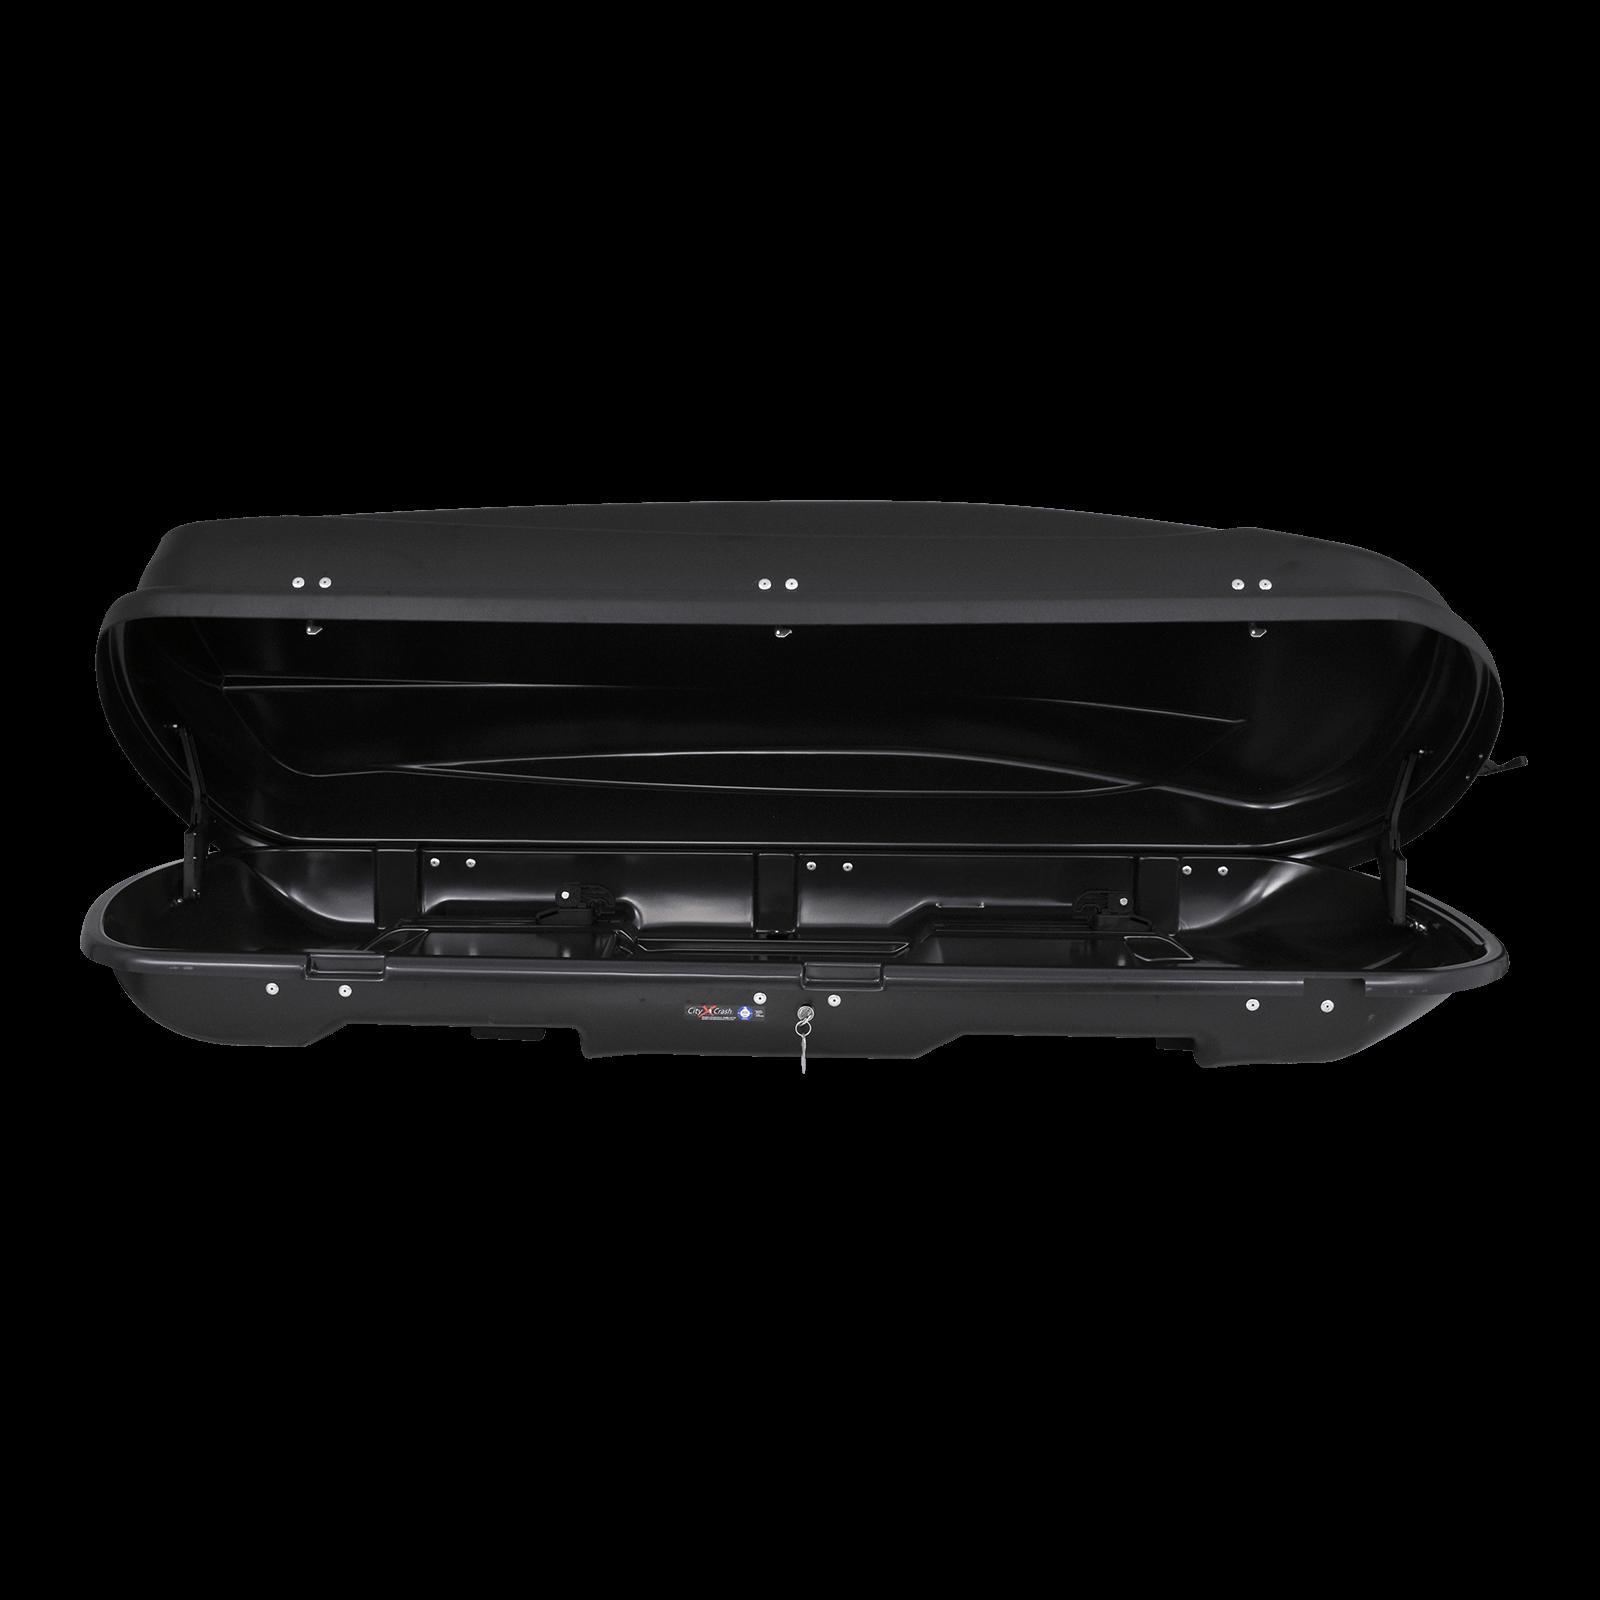 Dachbox Junior Xtreme 450 Black 441 - Bild 2